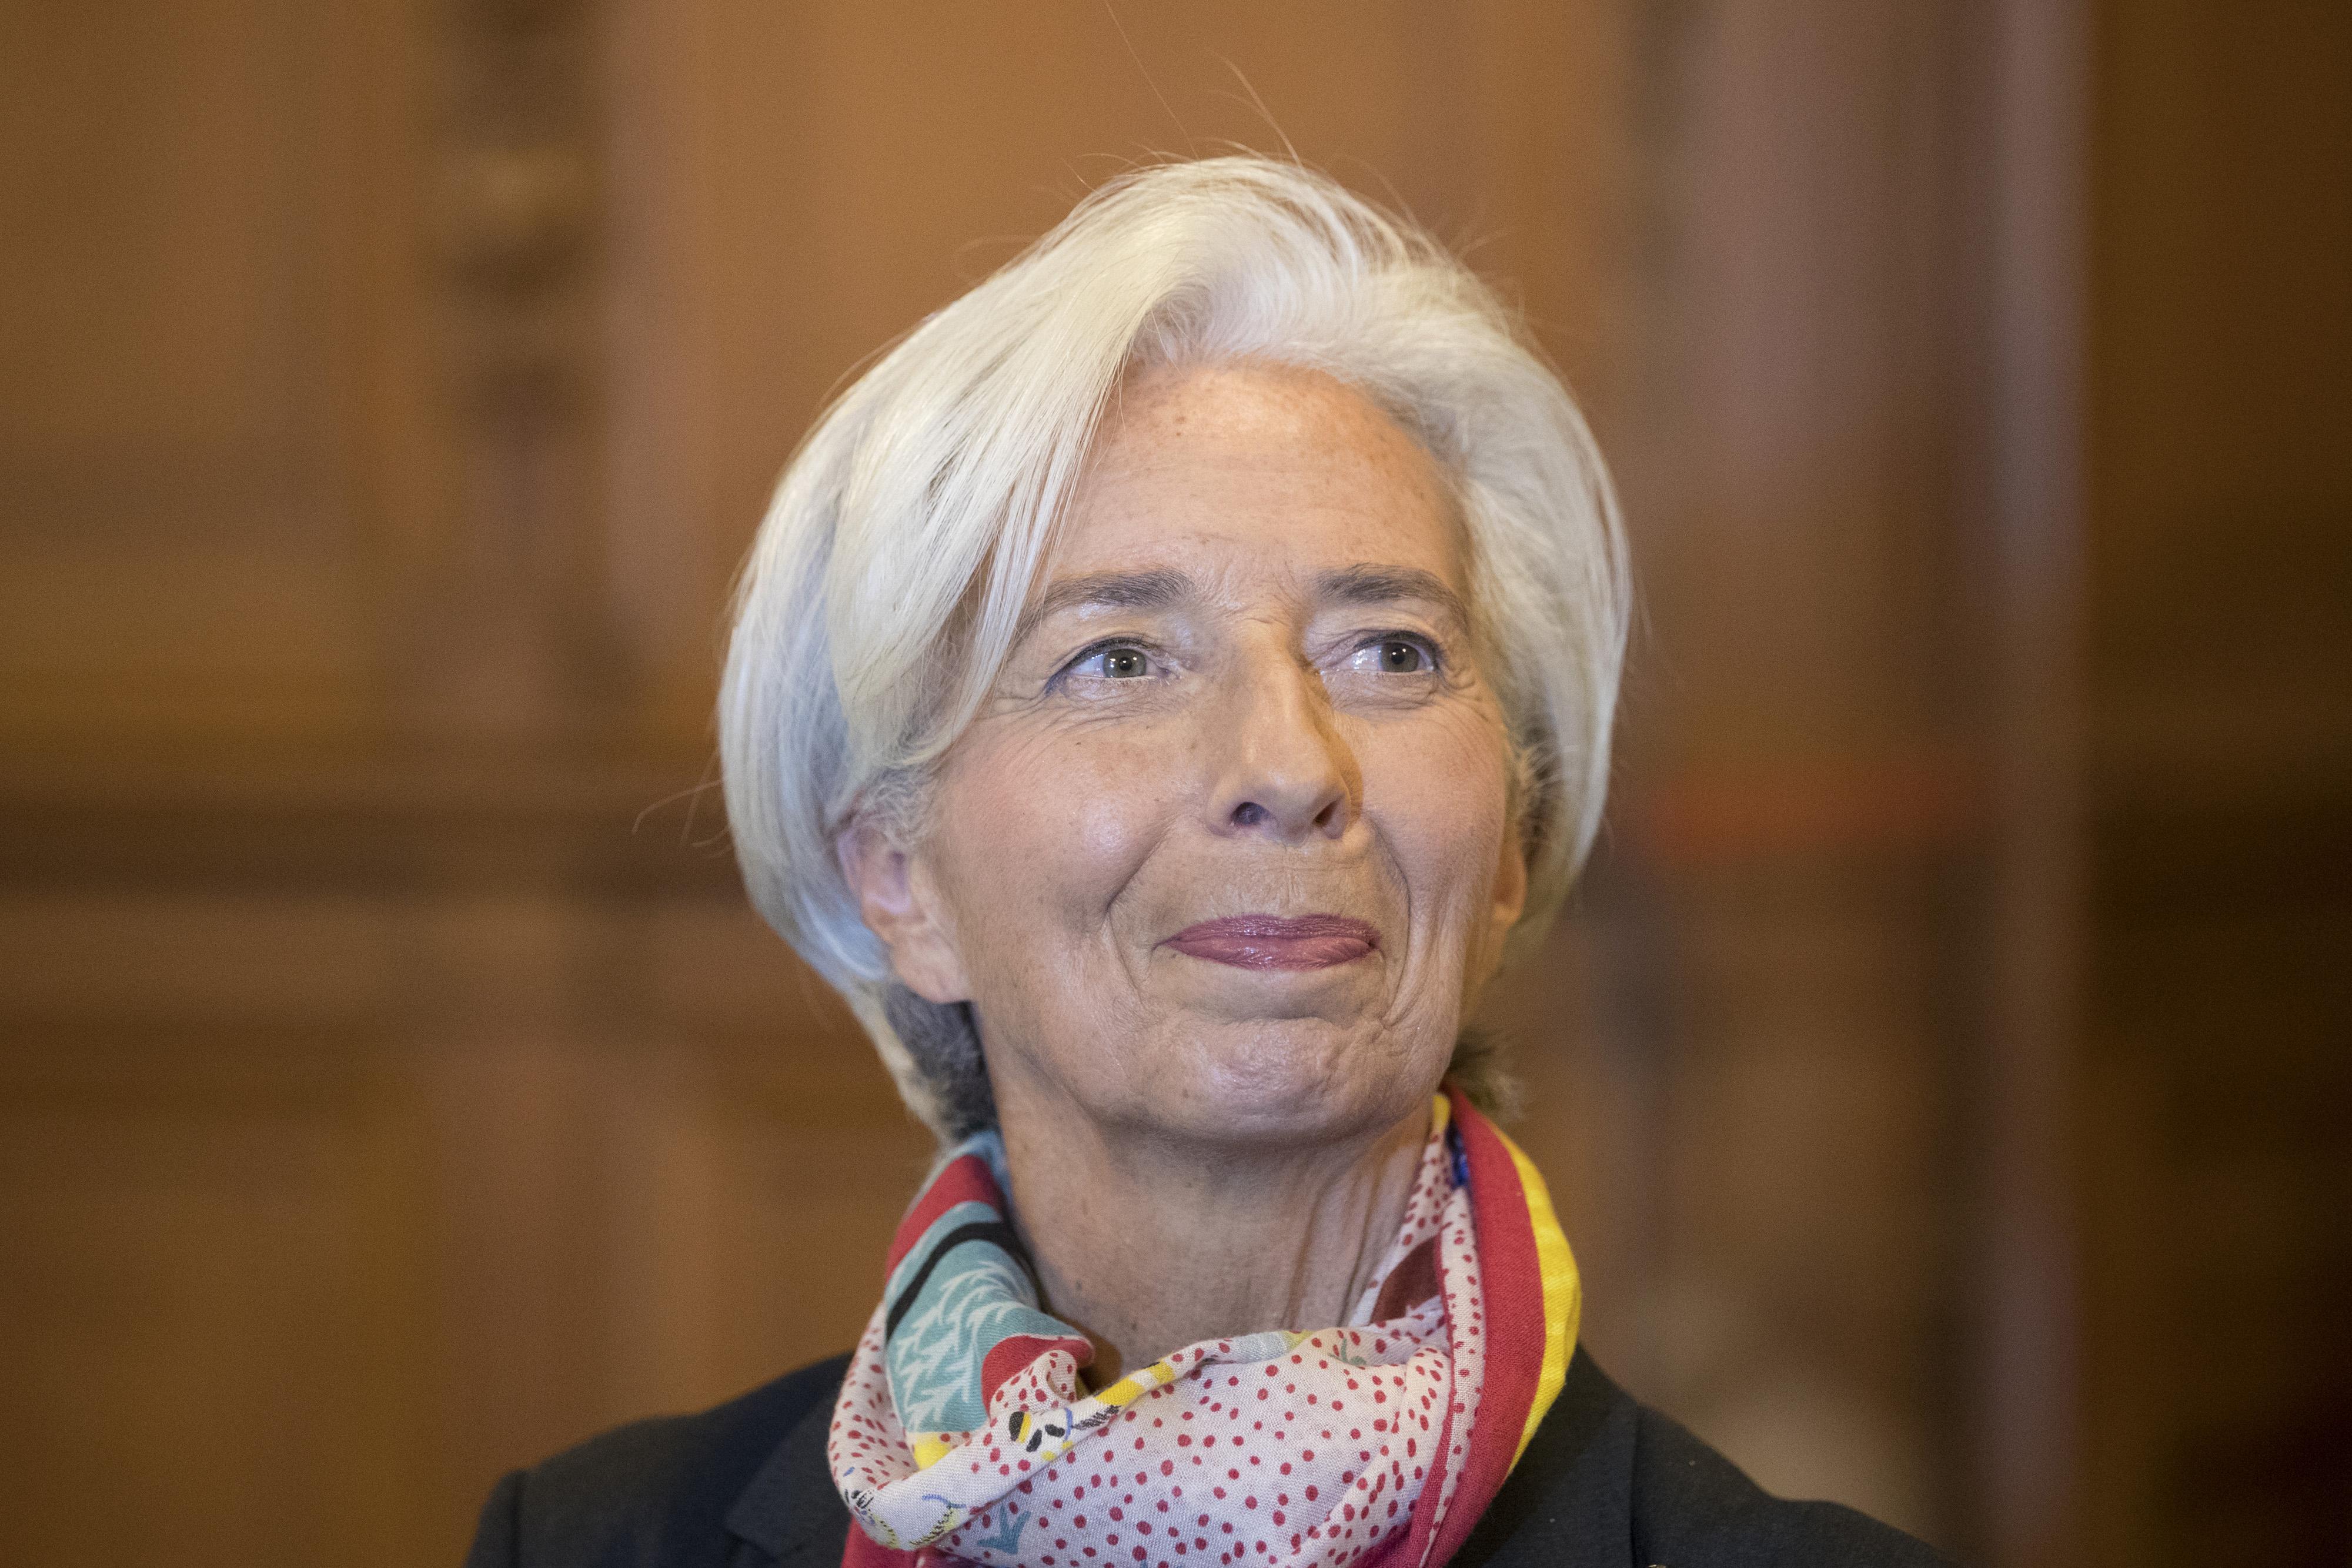 International Monetary Fund (IMF) Managing Director Christine Lagarde On Trial For Alleged Negligence